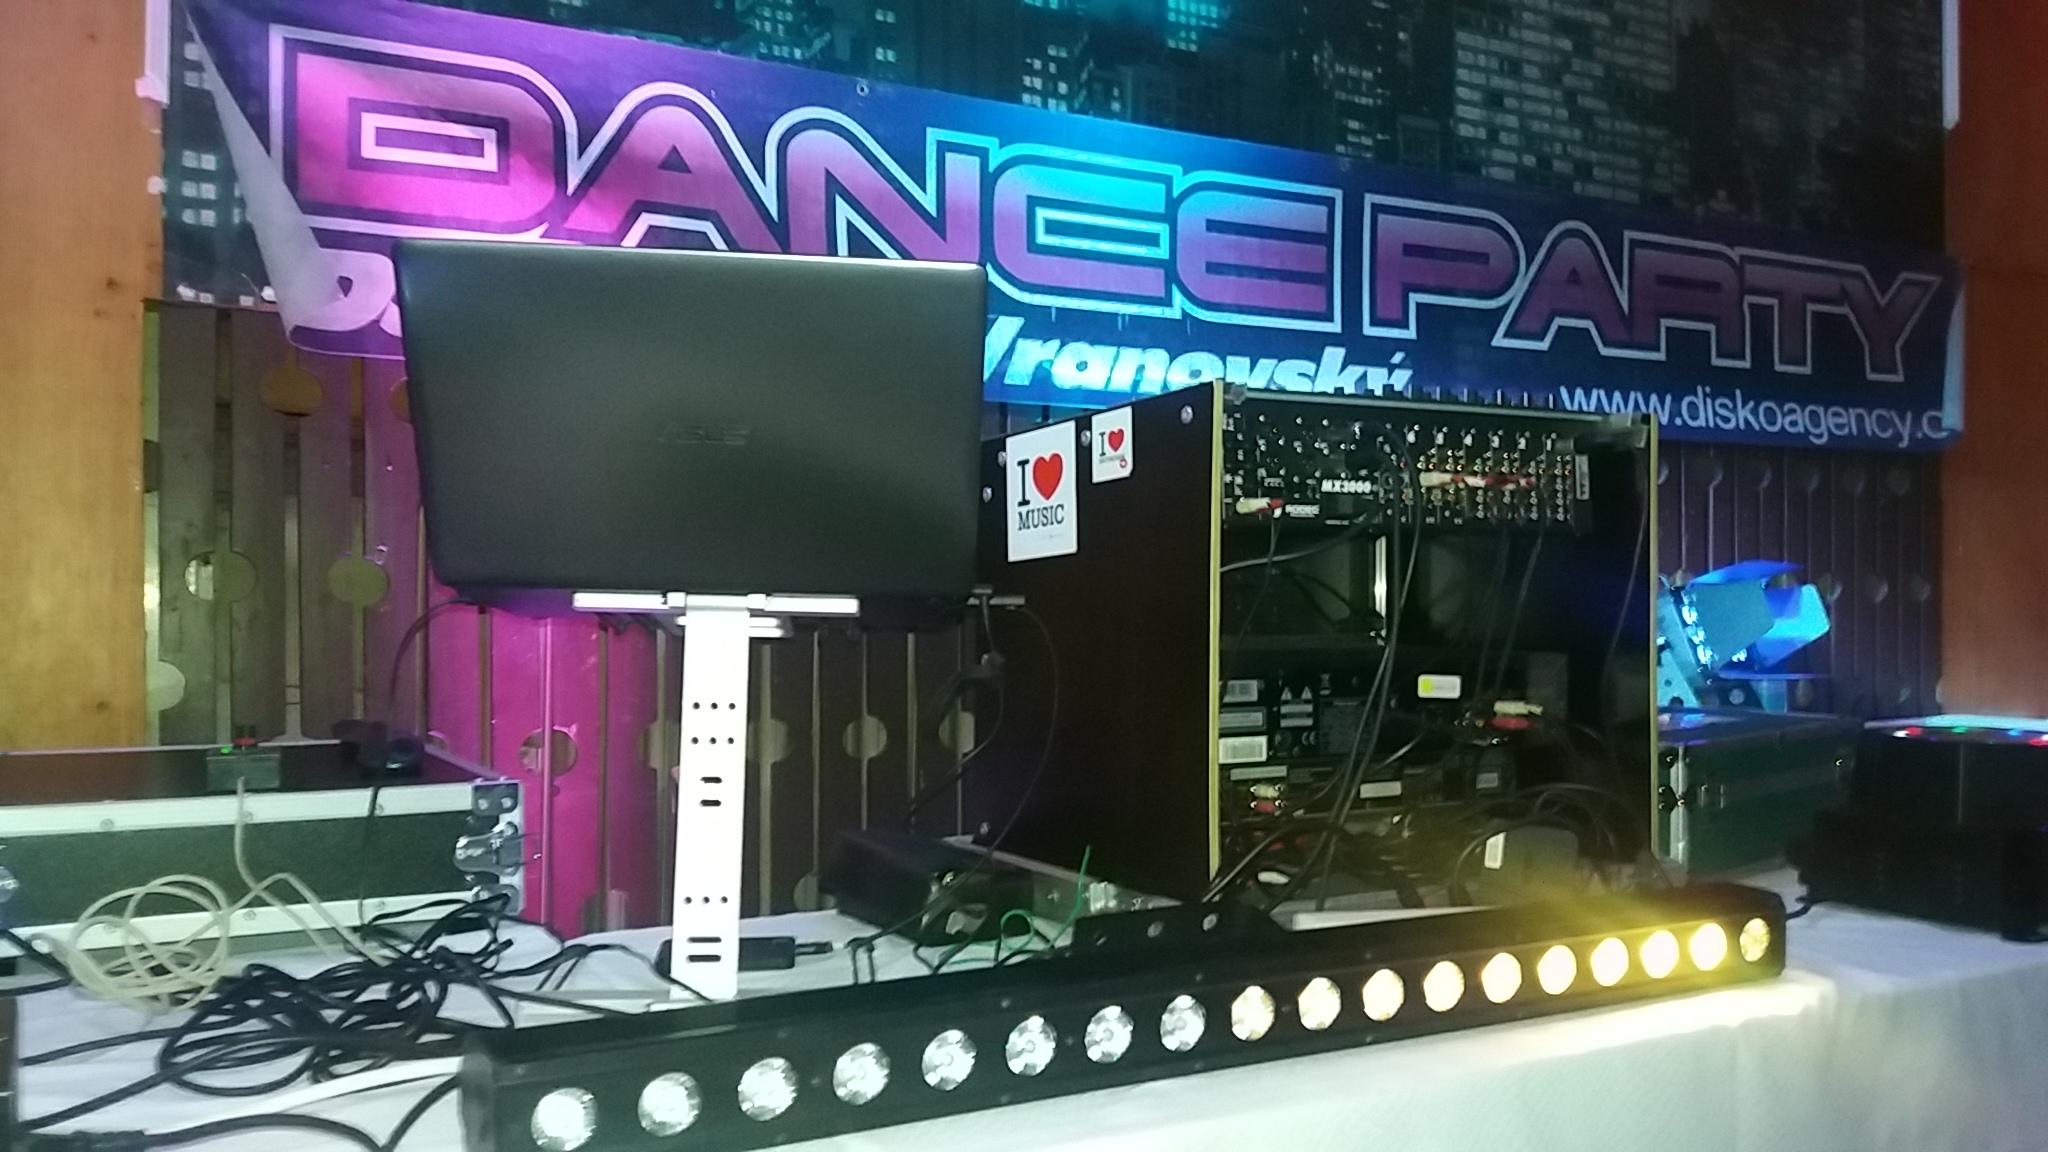 Neratovice Filmový ples sound EV Voice , Rodec  14.2.2020.jpg